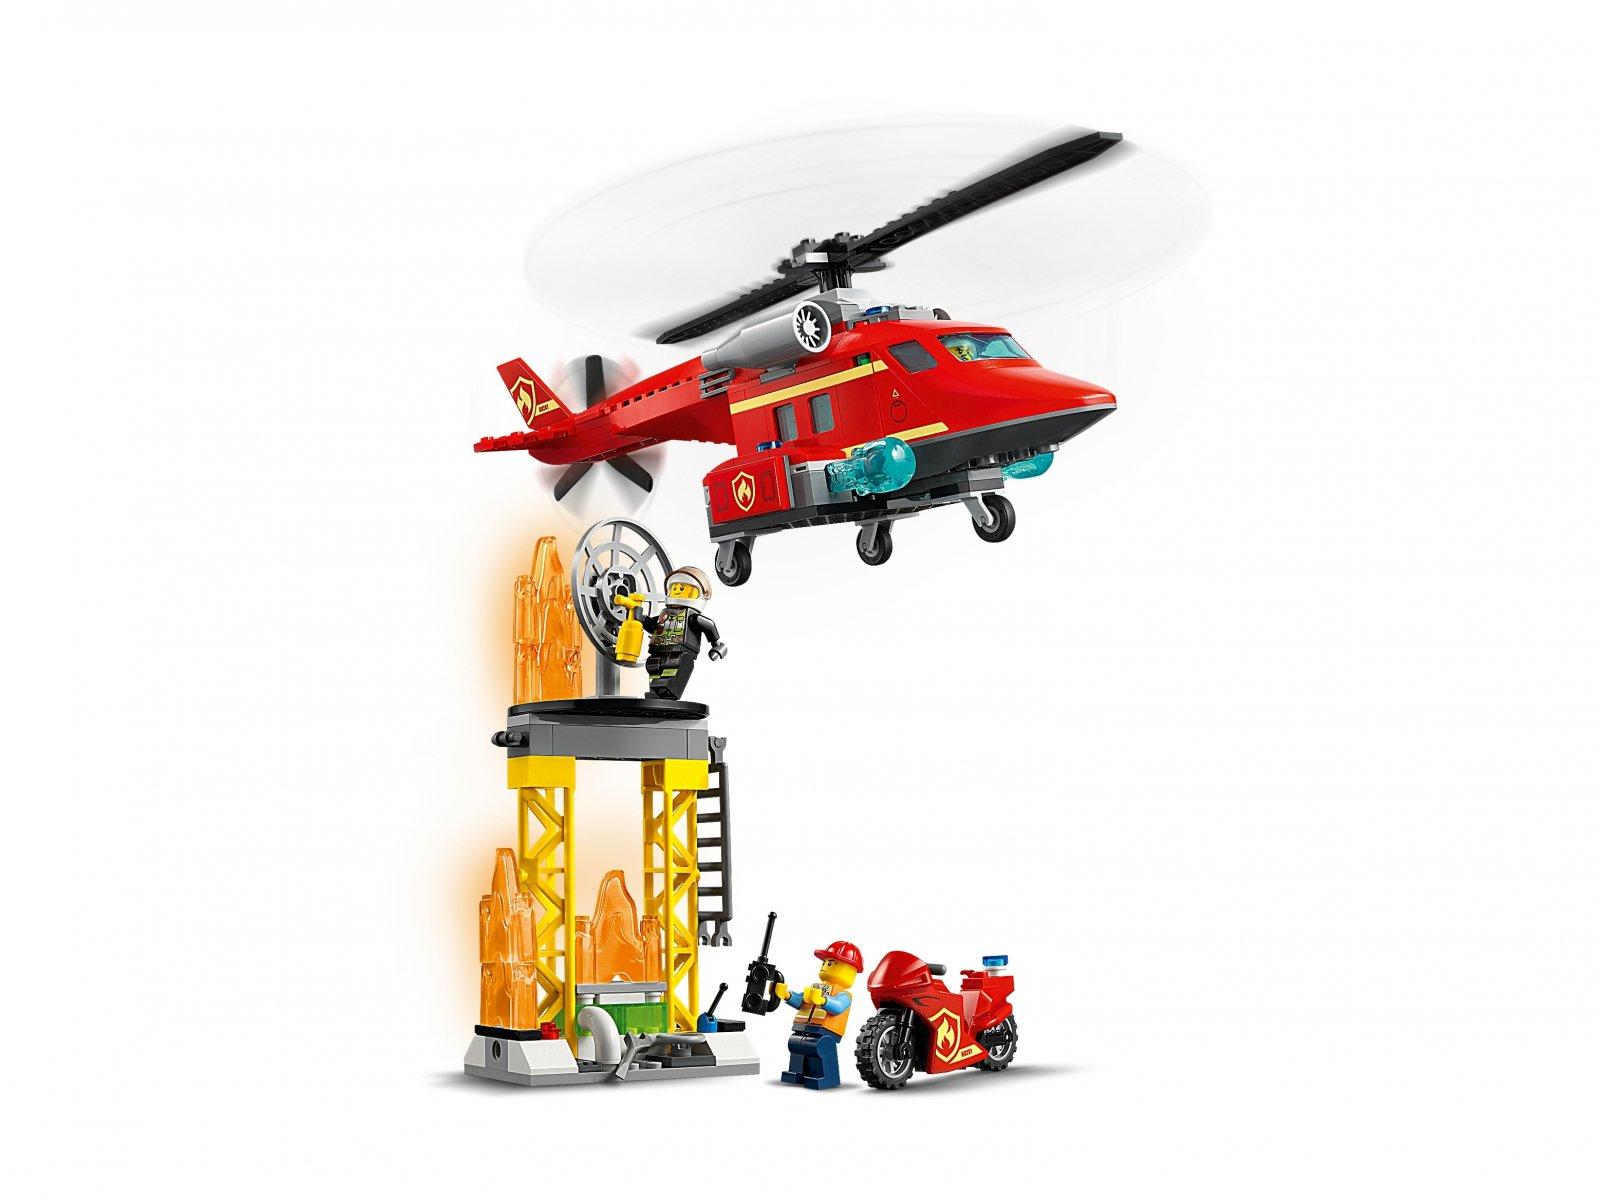 LEGO 60281 Strażacki helikopter ratunkowy